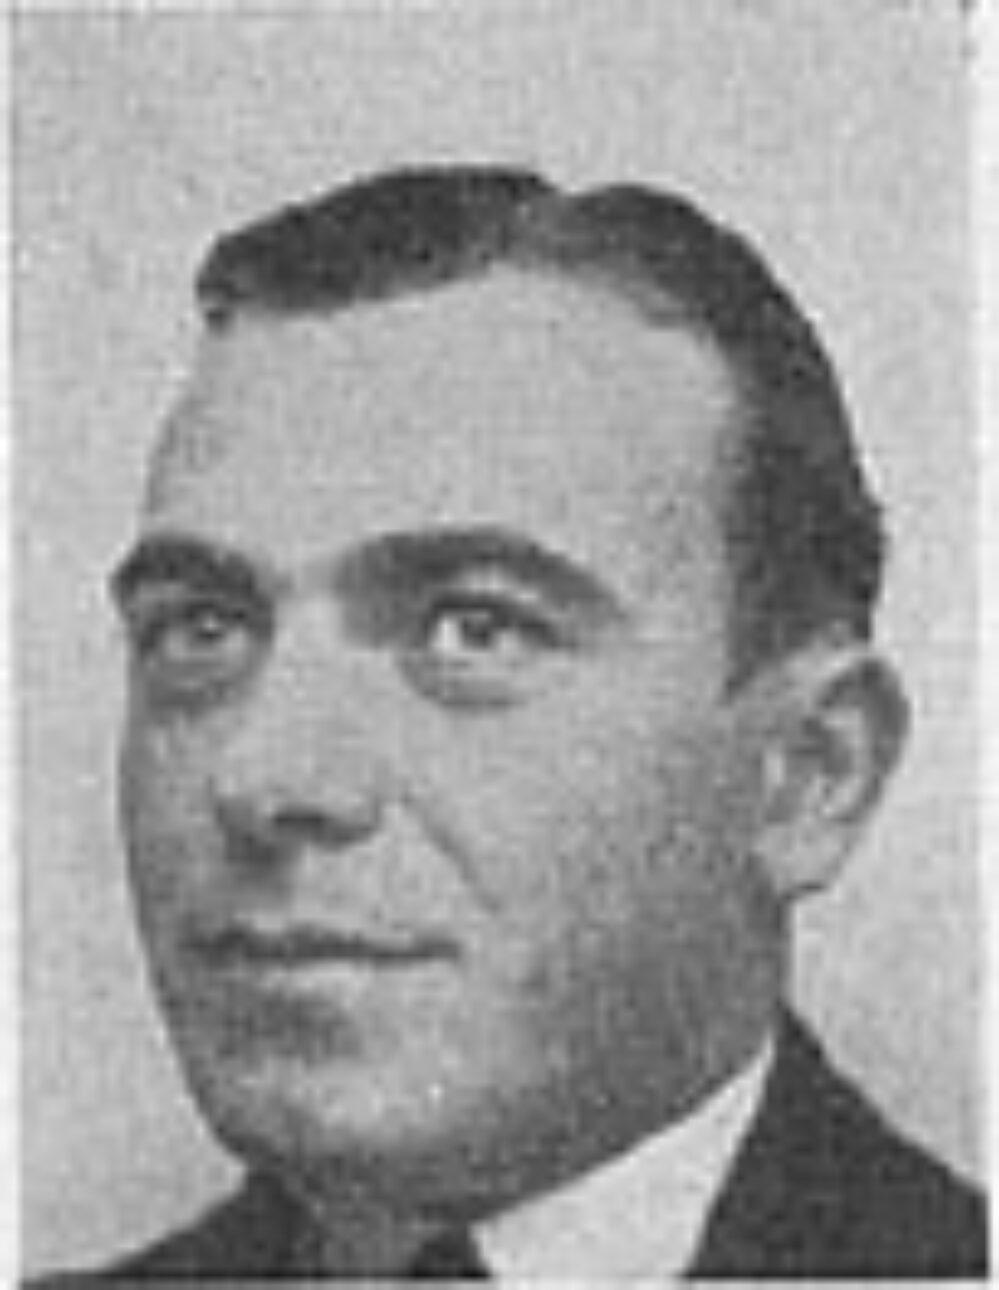 Karl Dahl